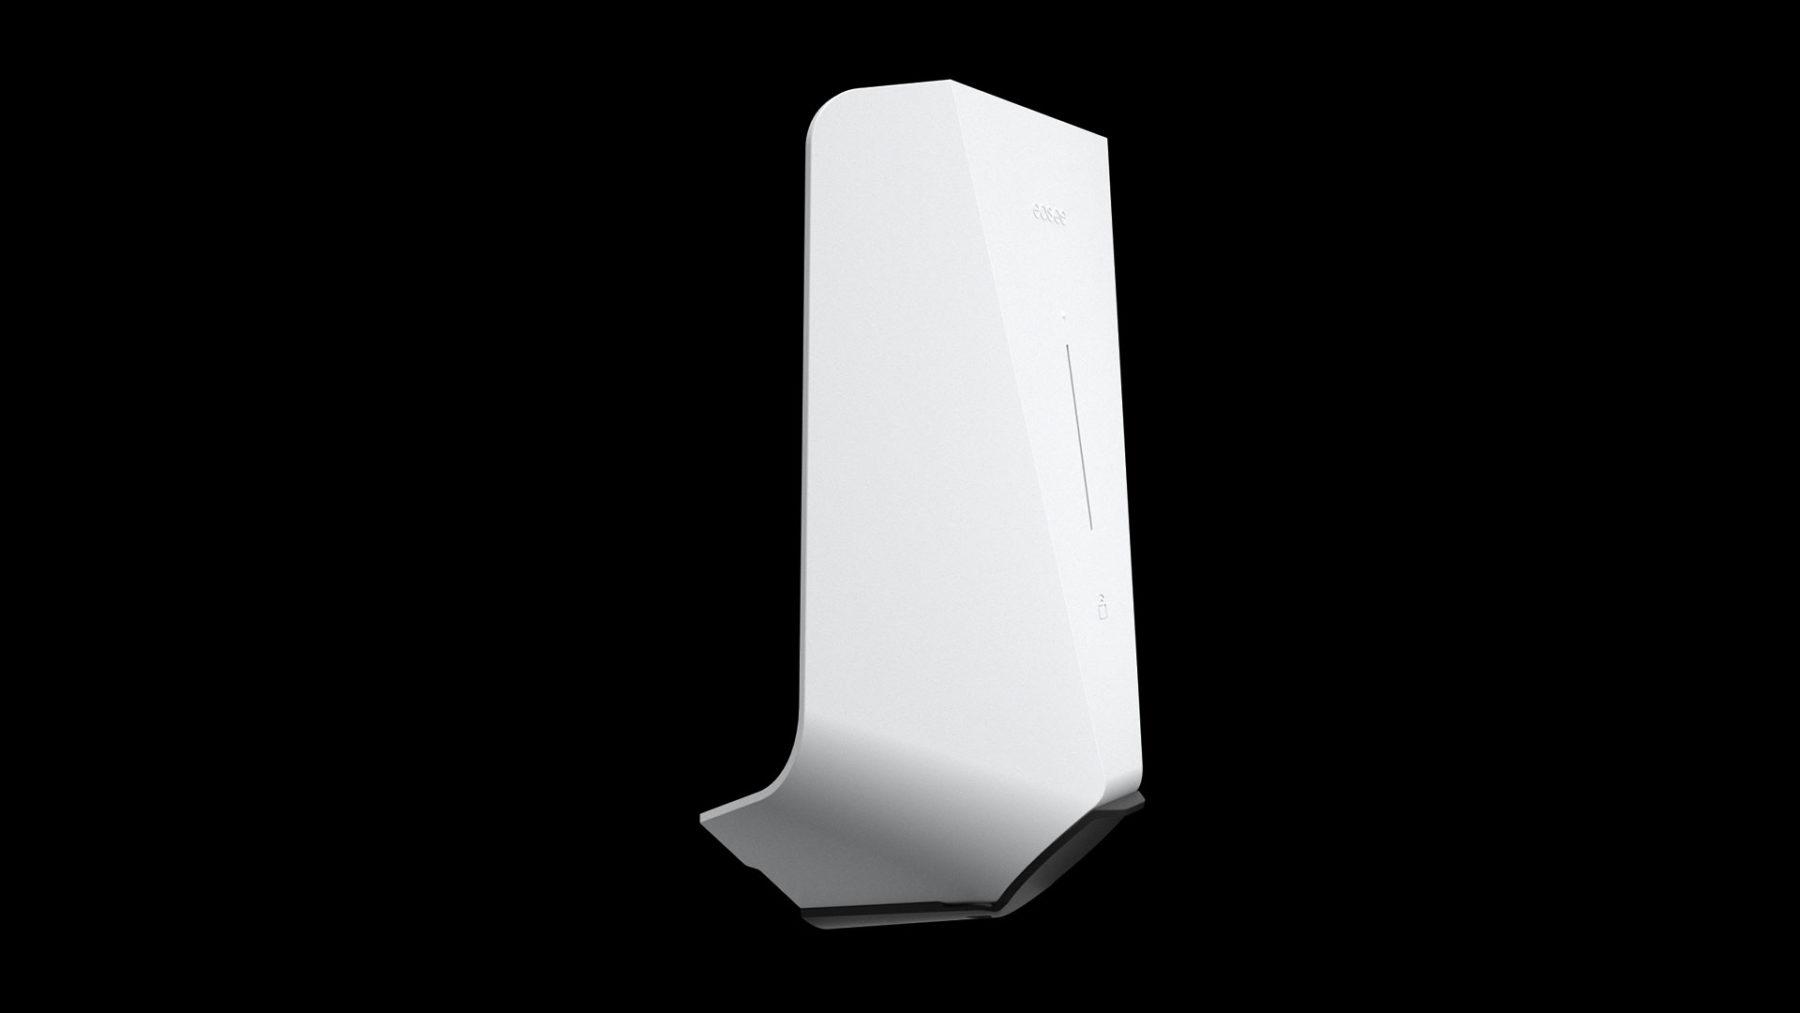 easee_front_cover_white_black_bg-1800x1013